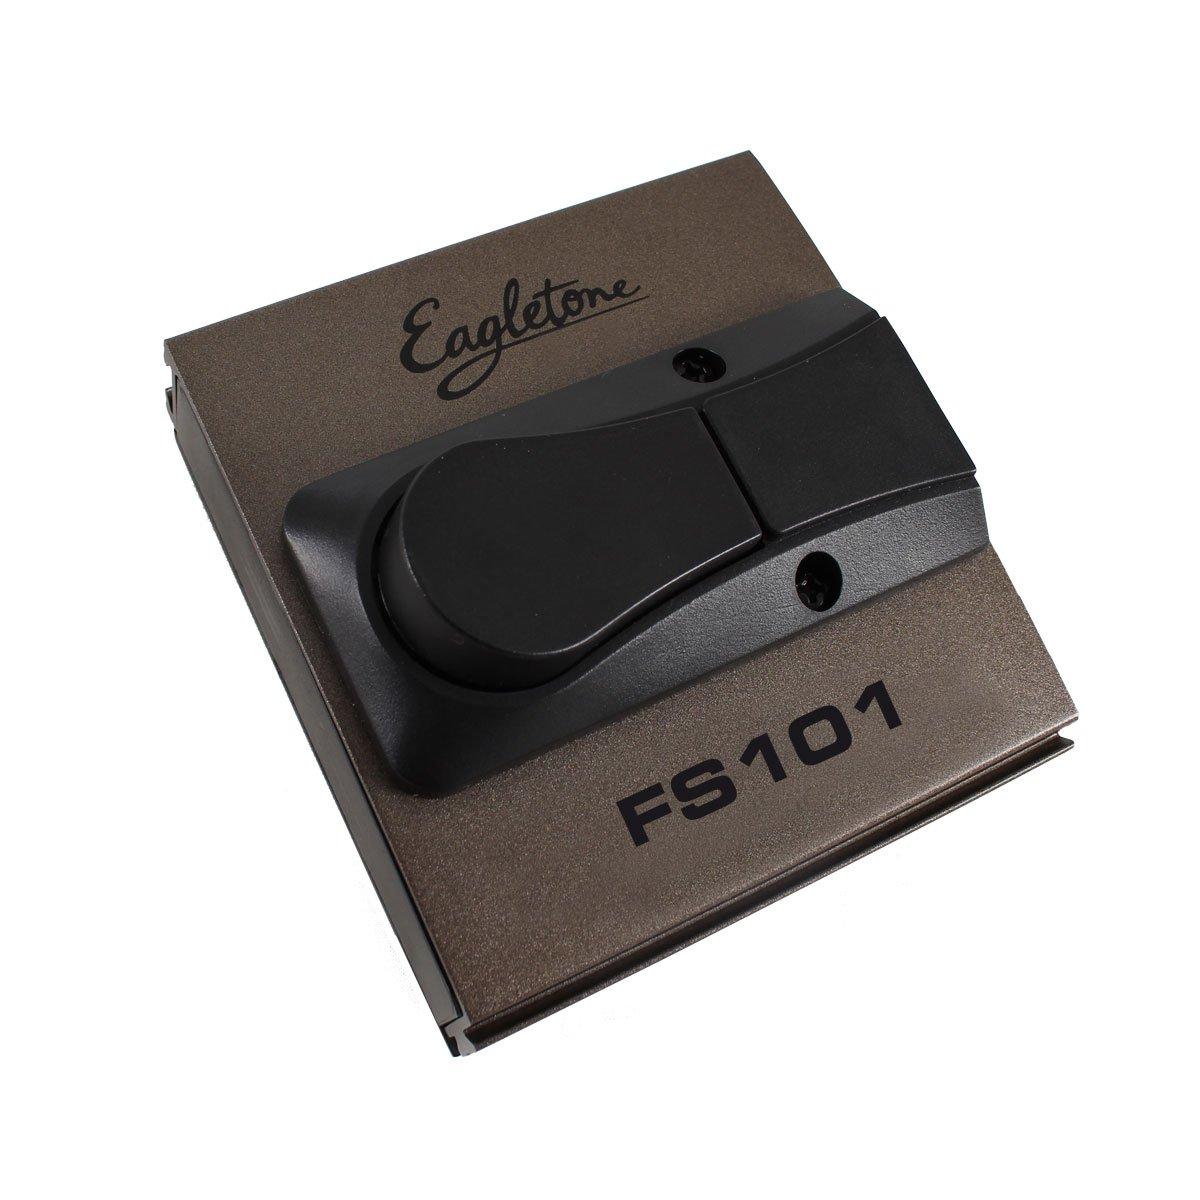 Eagletone FS101Pedale Footswitch Nero FS101 - LATCH